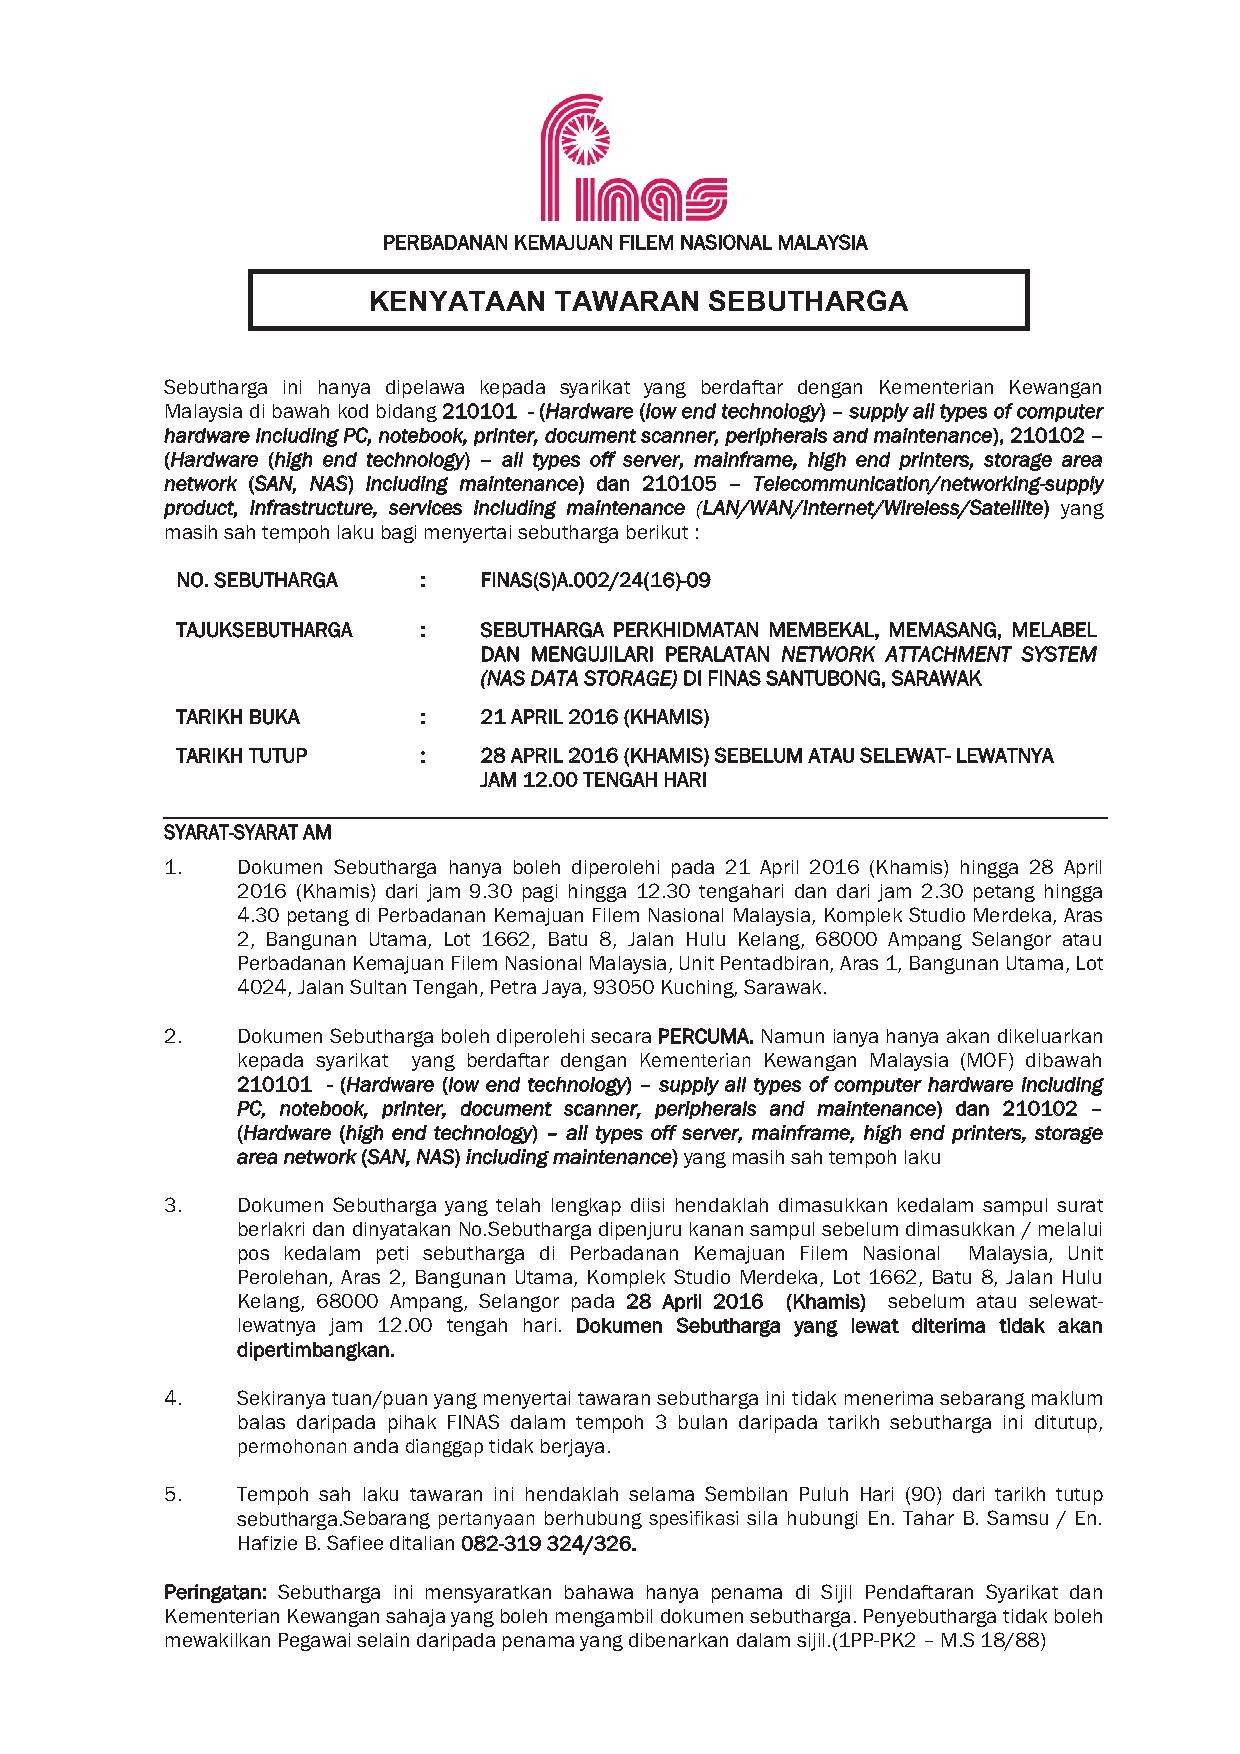 KENYATAAN TAWARAN 09